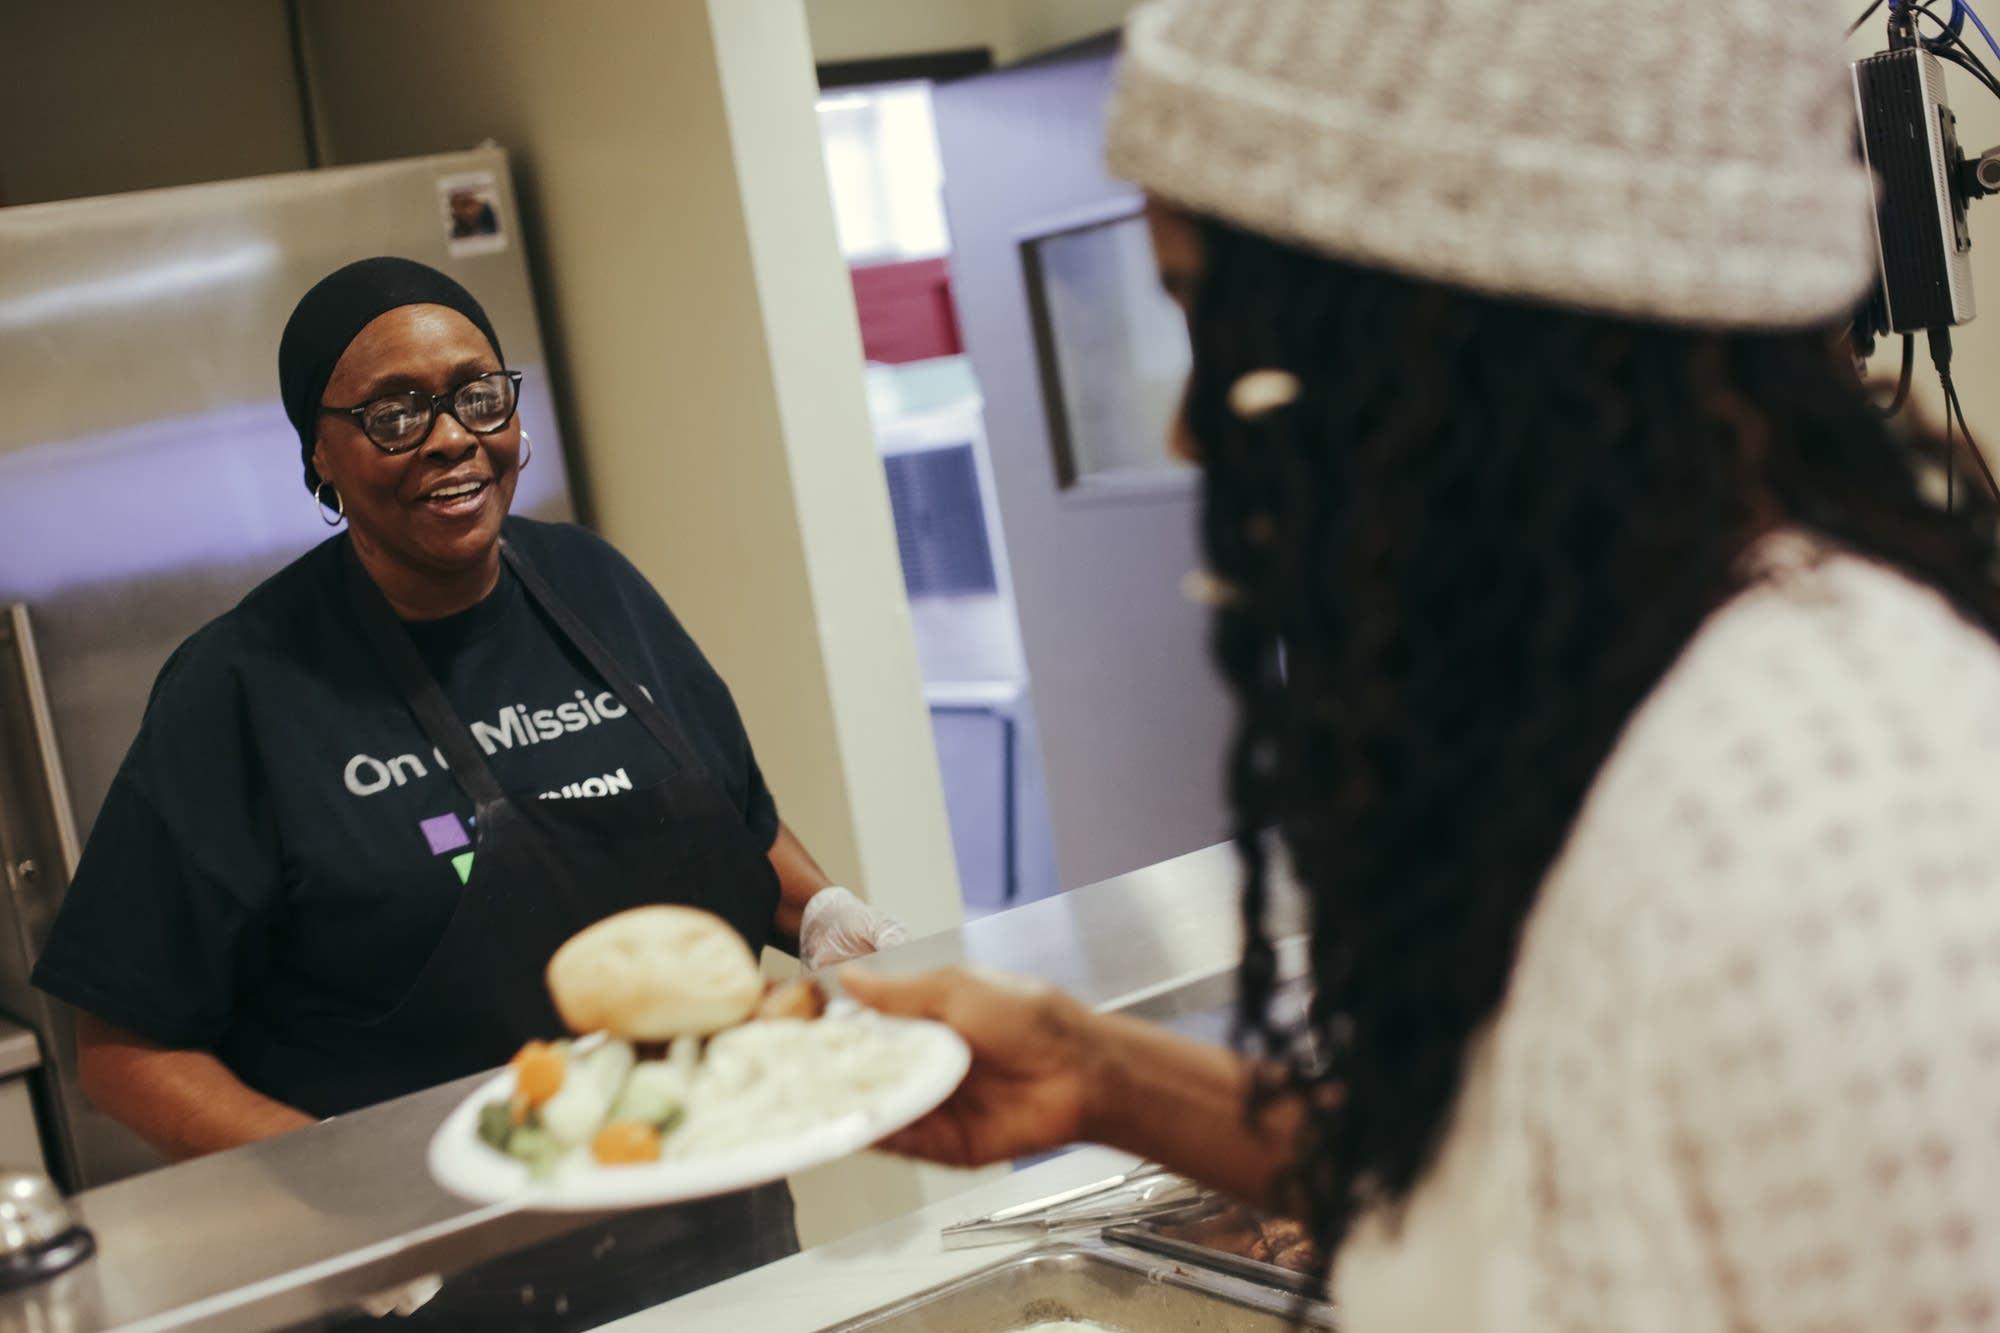 Roseline Charles serves up lunch inside of the Union Gospel Mission